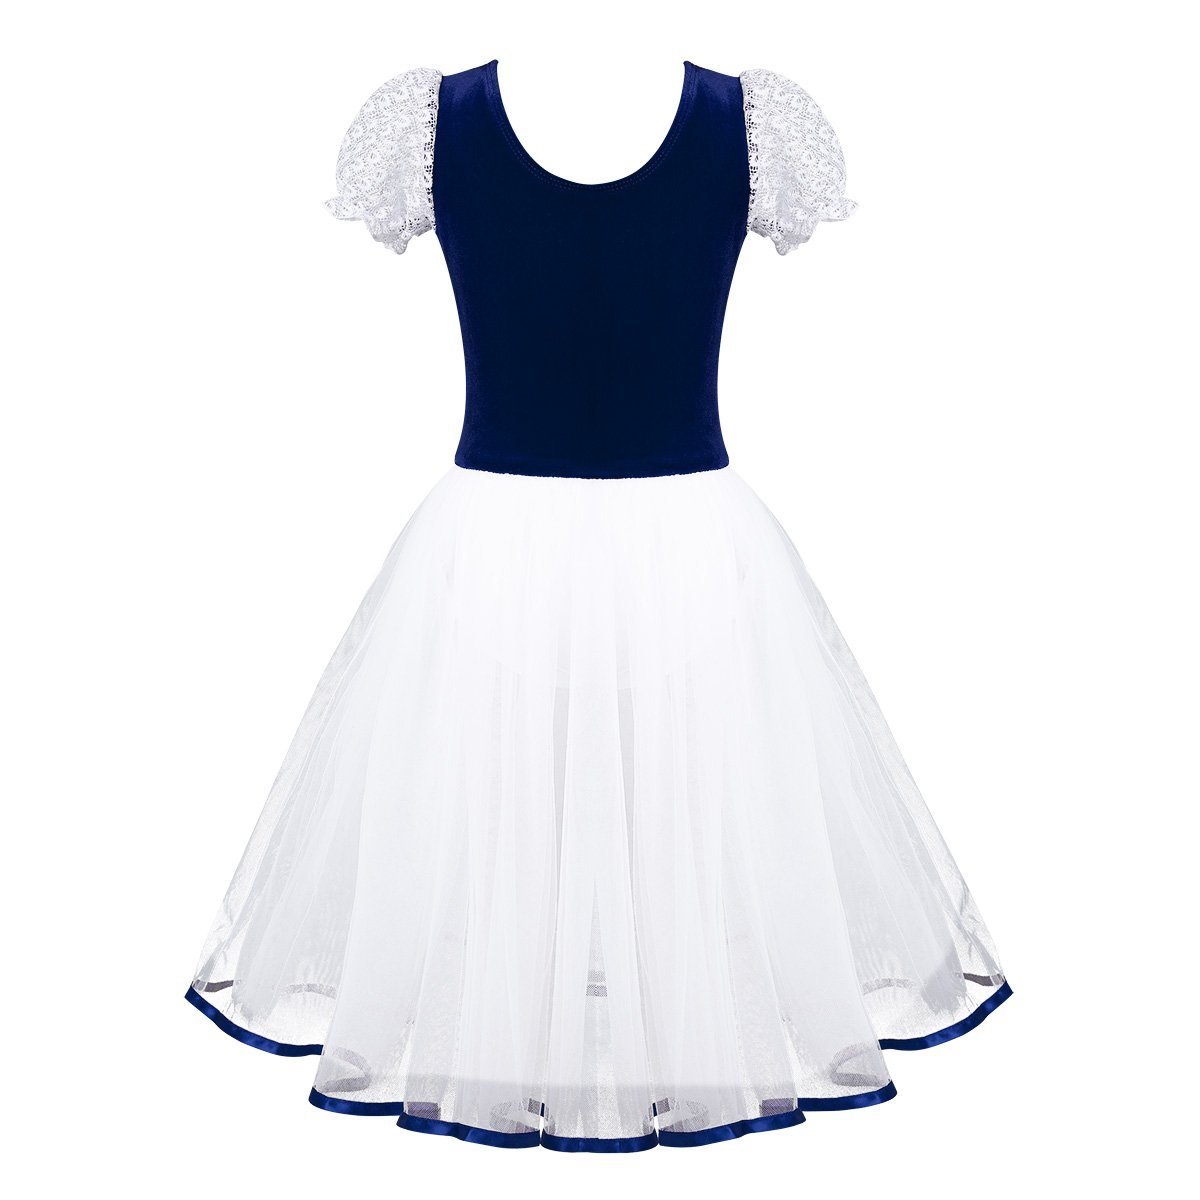 iiniim Kids Girls Lacework Bubble Sleeves Tutu Ballet Dance Leotard Dancer Dress Ballerina Fancy Costumes